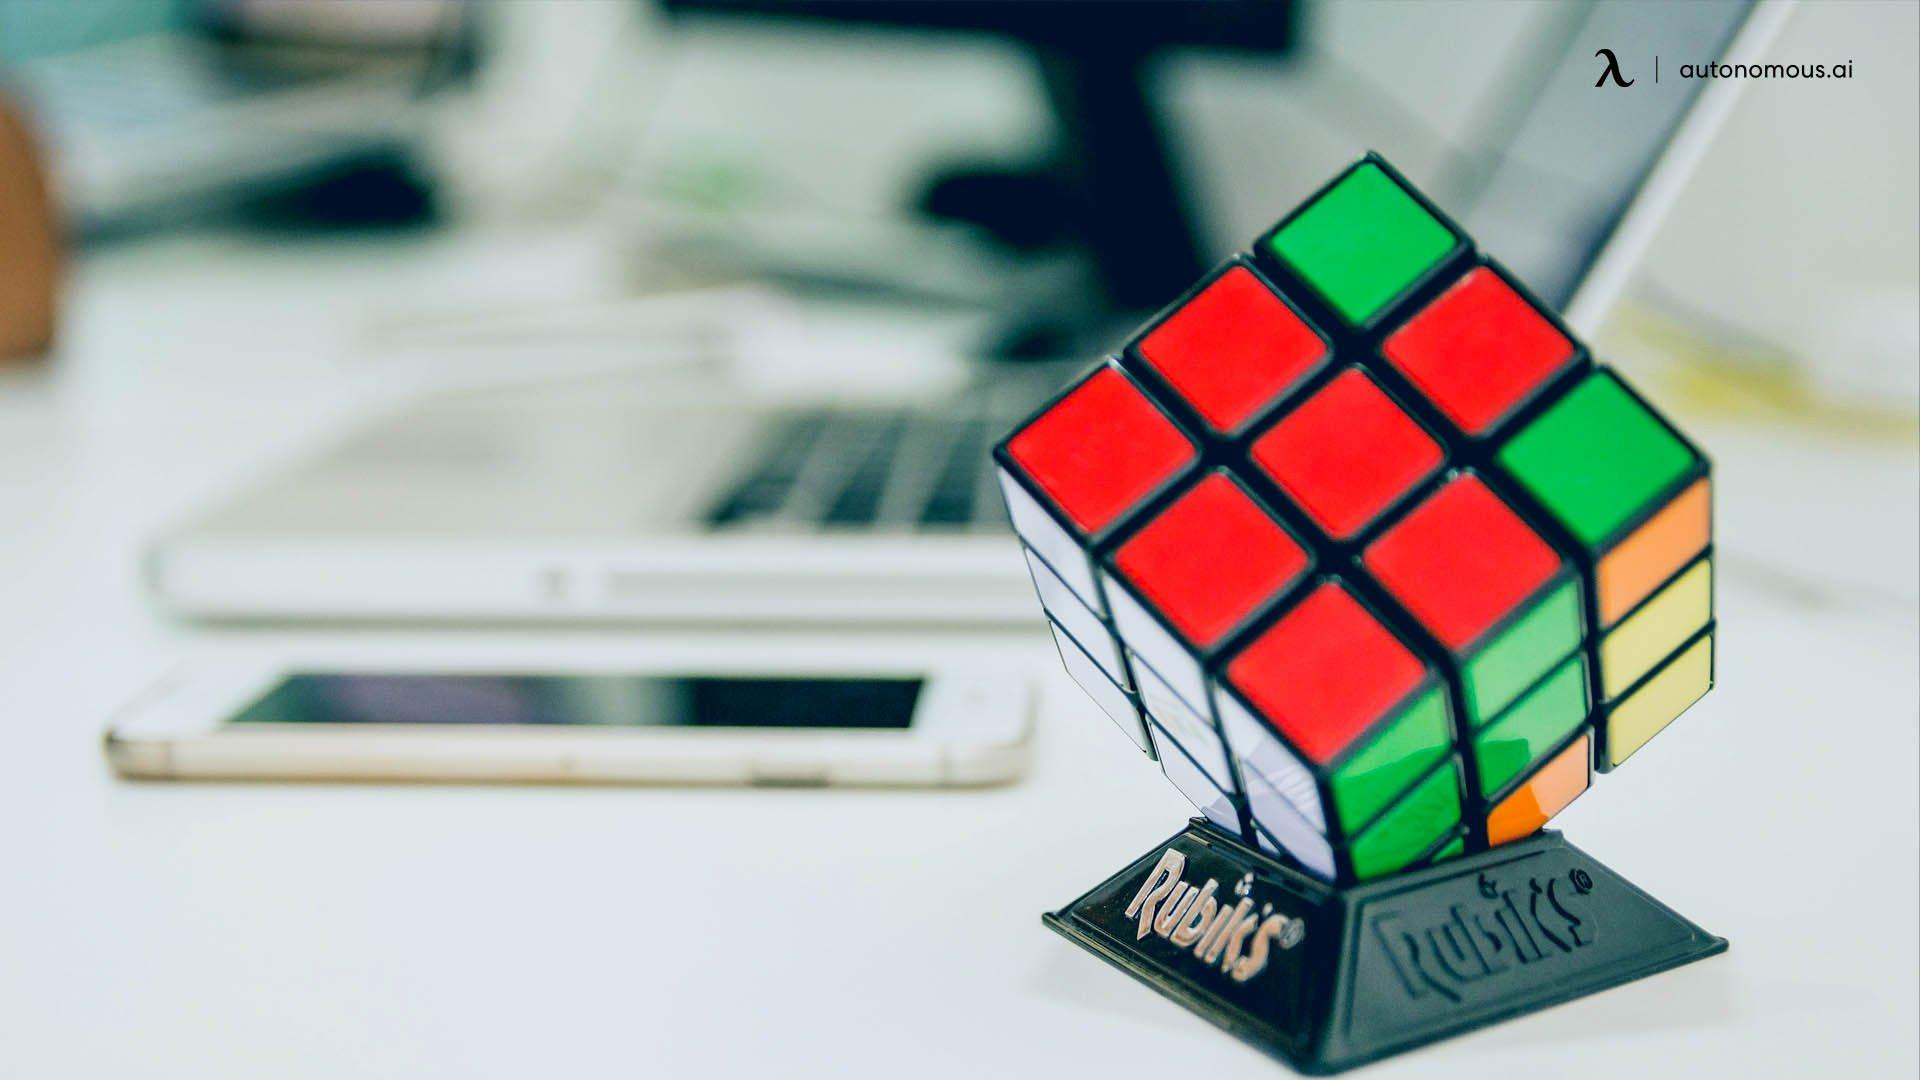 A Speed Cube or Rubik Cube